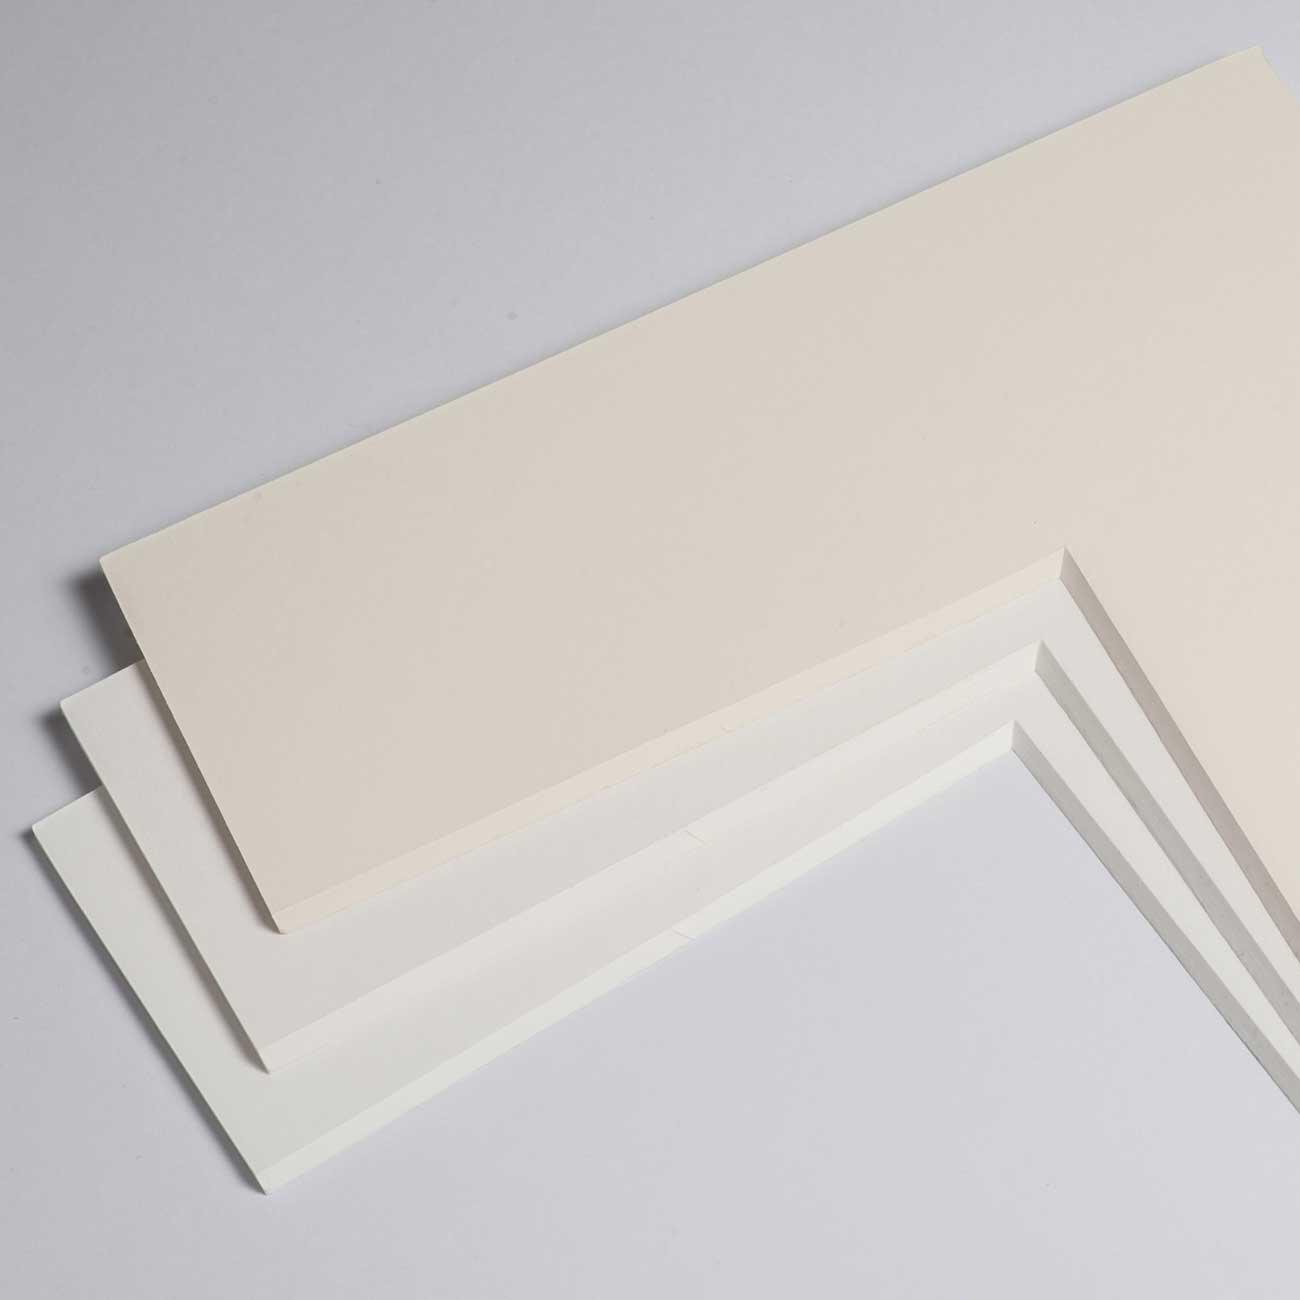 3,2 mm Baumwoll-Passepartout mit individuellem Ausschnitt